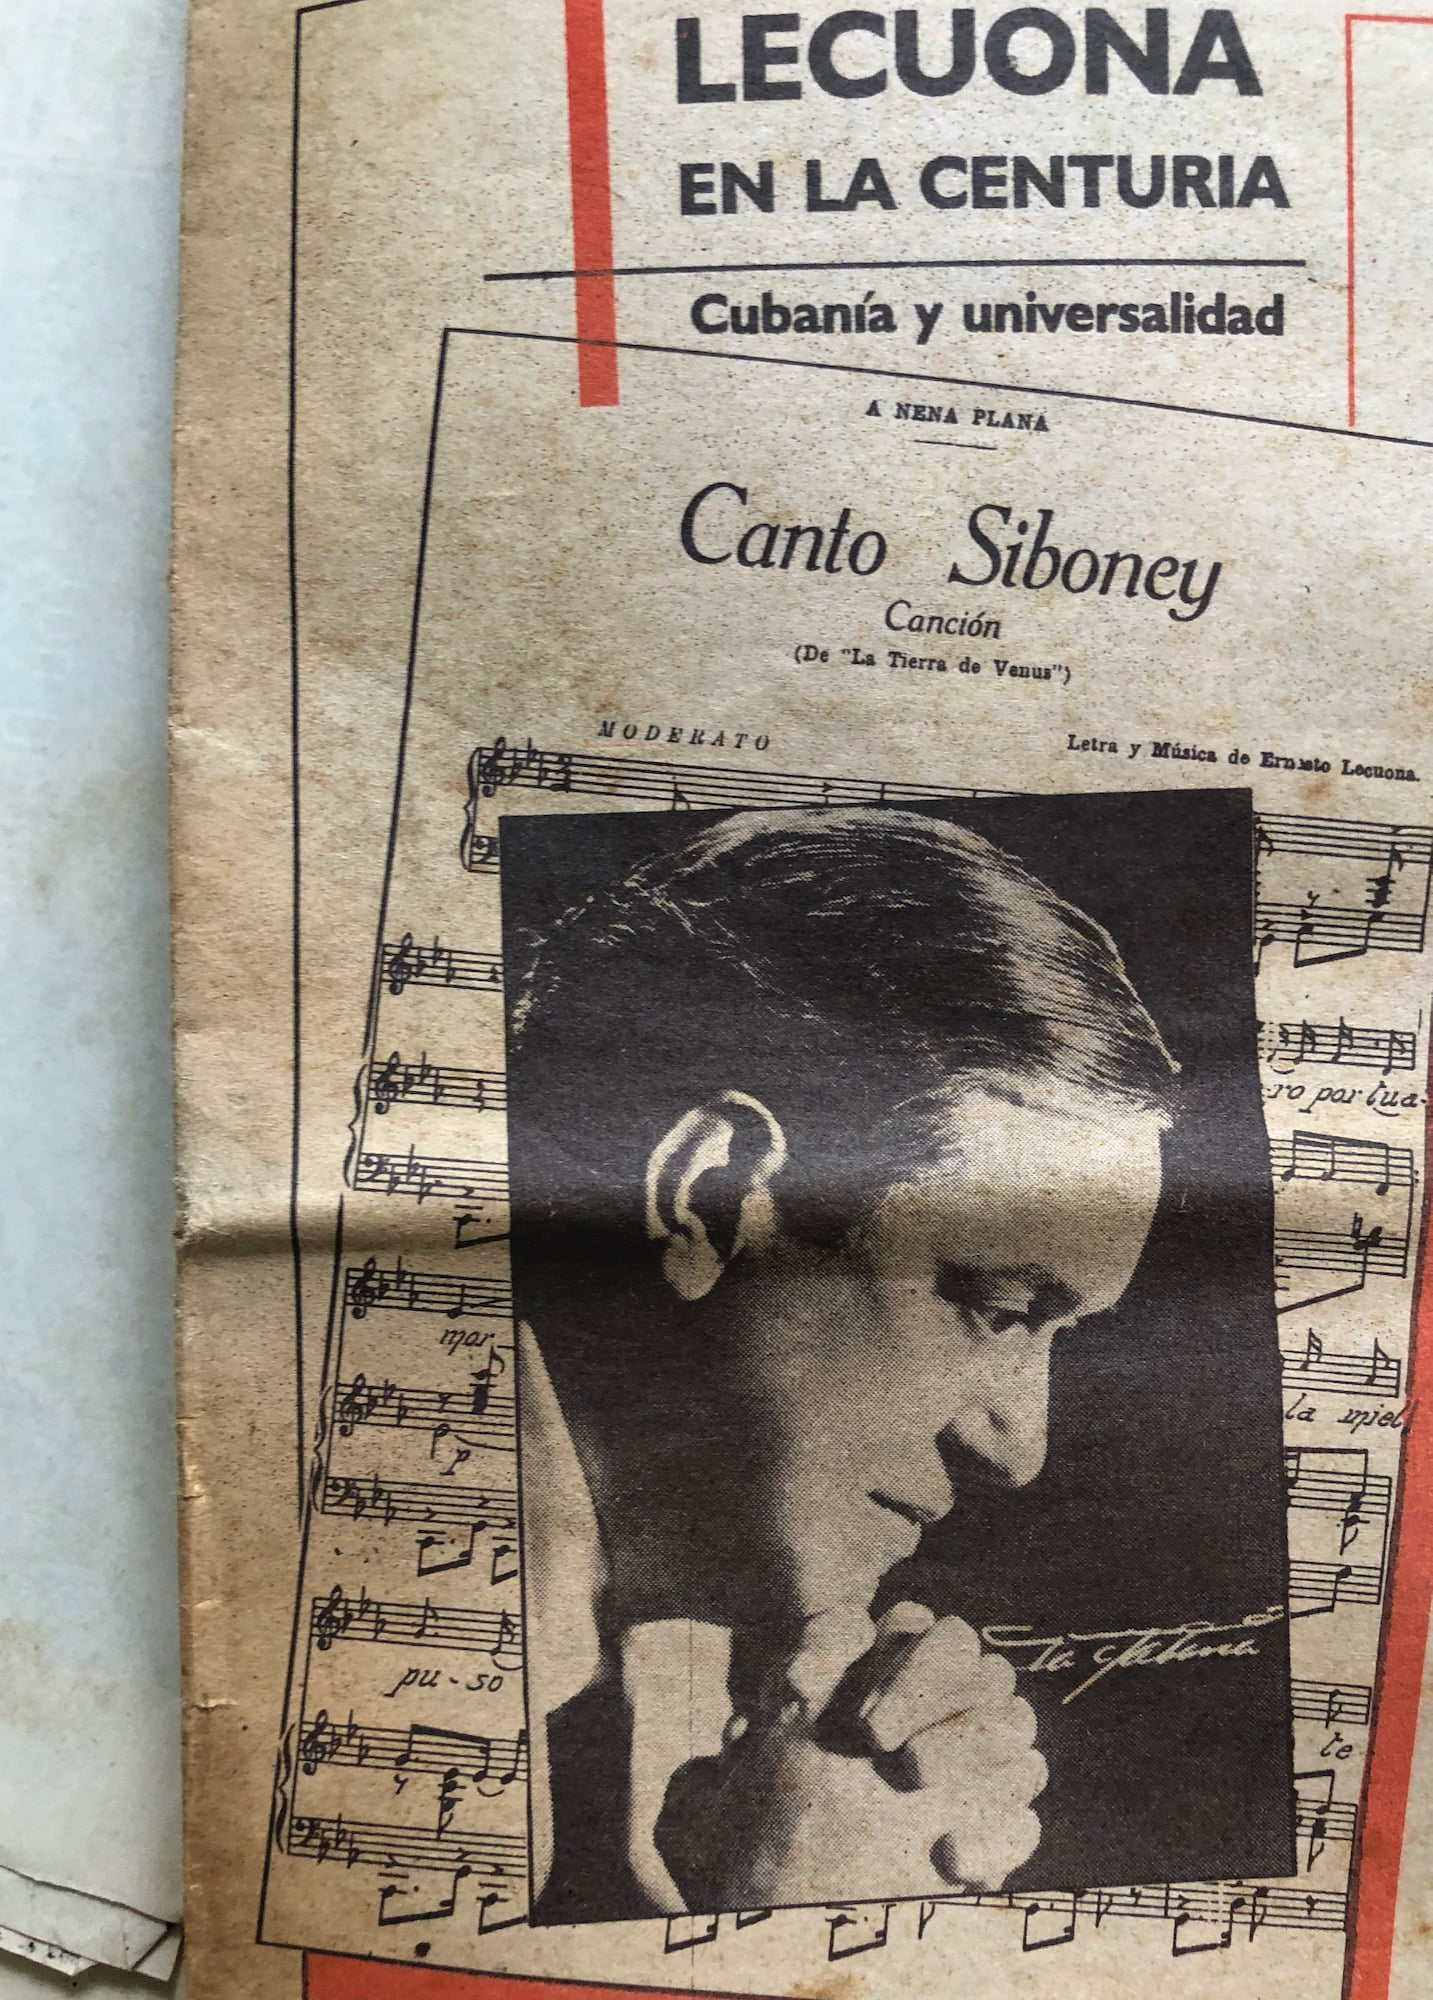 Siboney - Written by Ernesto Lecuona